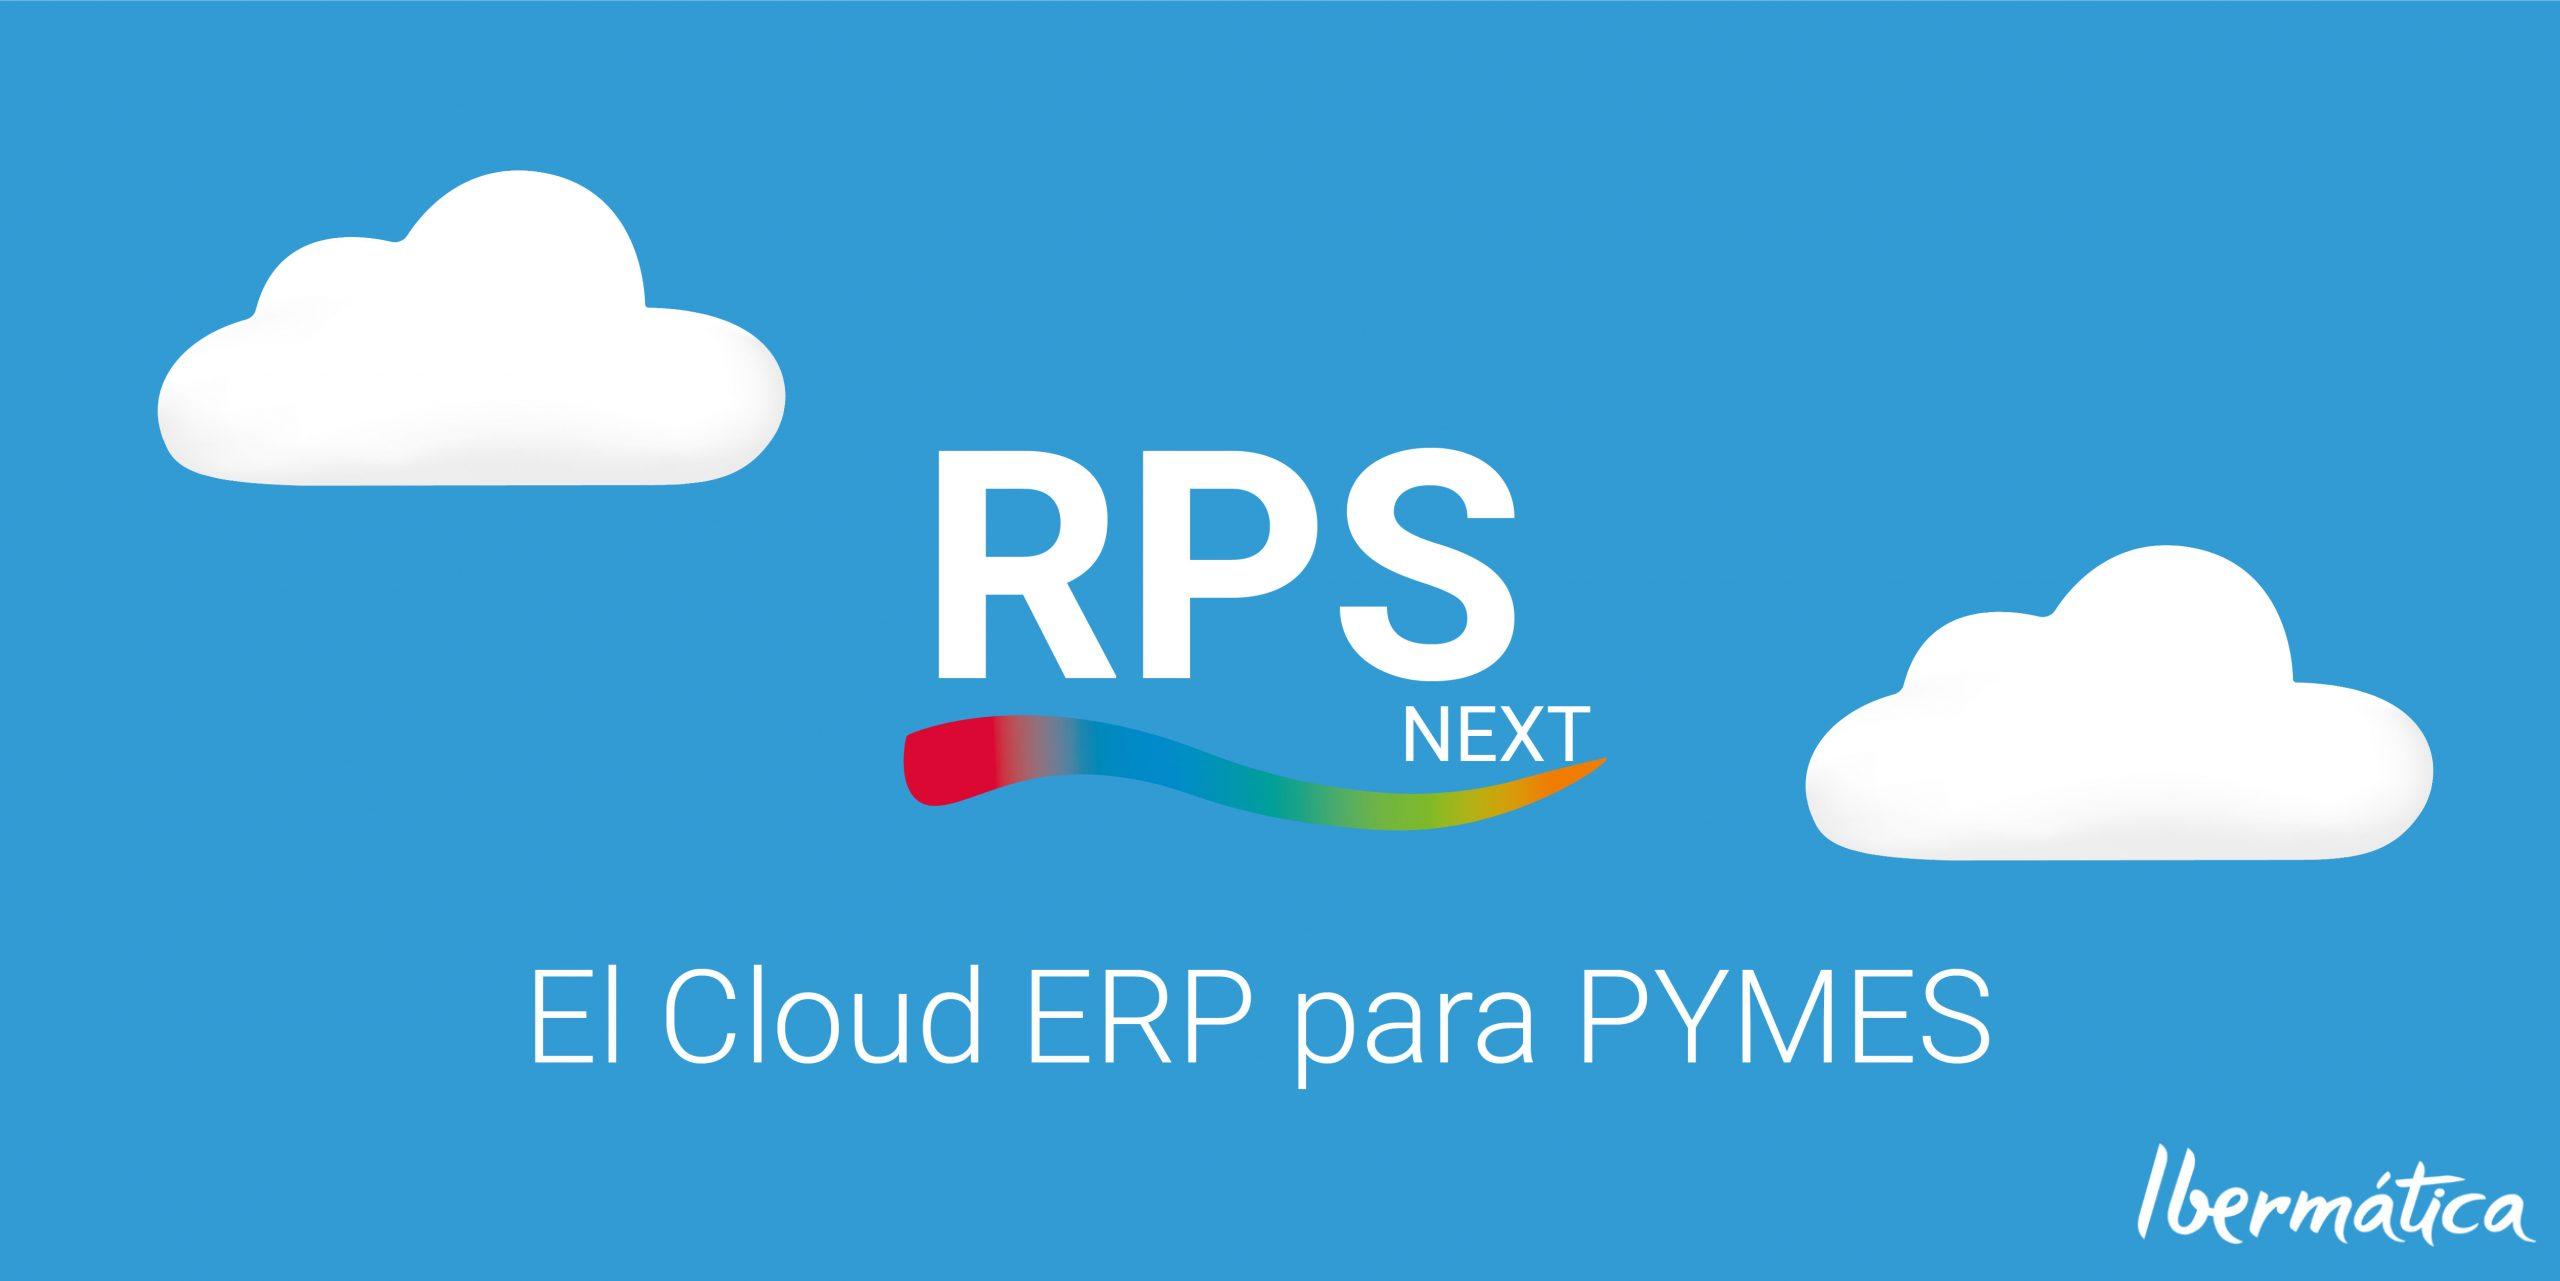 RPS Next, el Cloud ERP para PYMES INDUSTRIALES